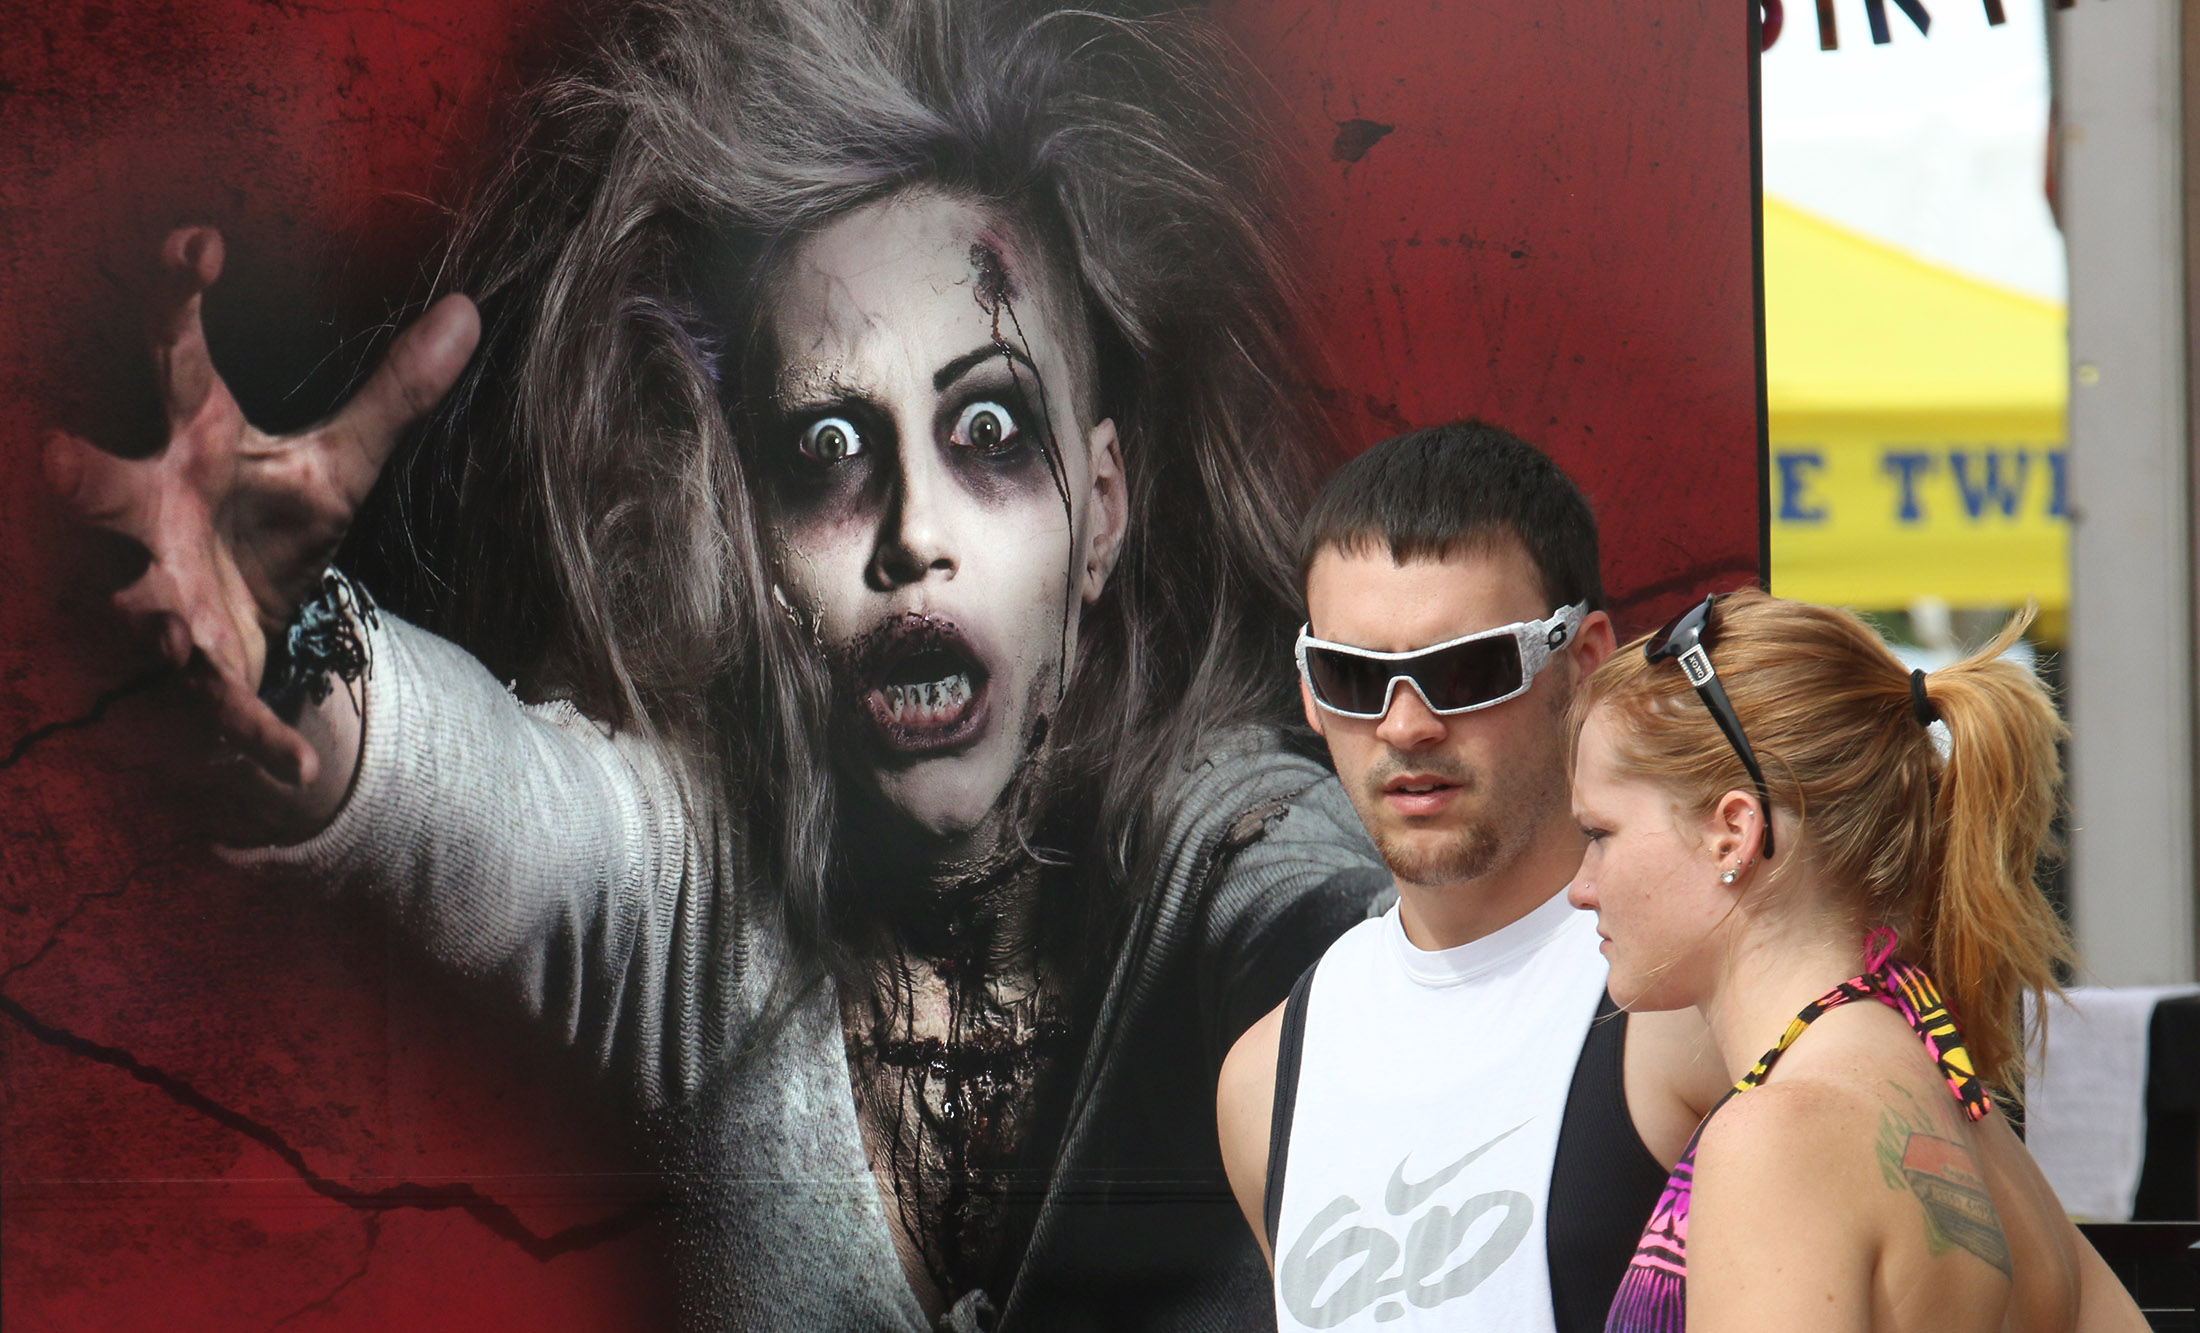 A couple walking down the sidewalk  pause next to a halloween themed advertisement along Main Street as Biketoberfest rolls into day 2 in Daytona Beach Friday  October 16, 2015. News-Journal/JIM TILLER